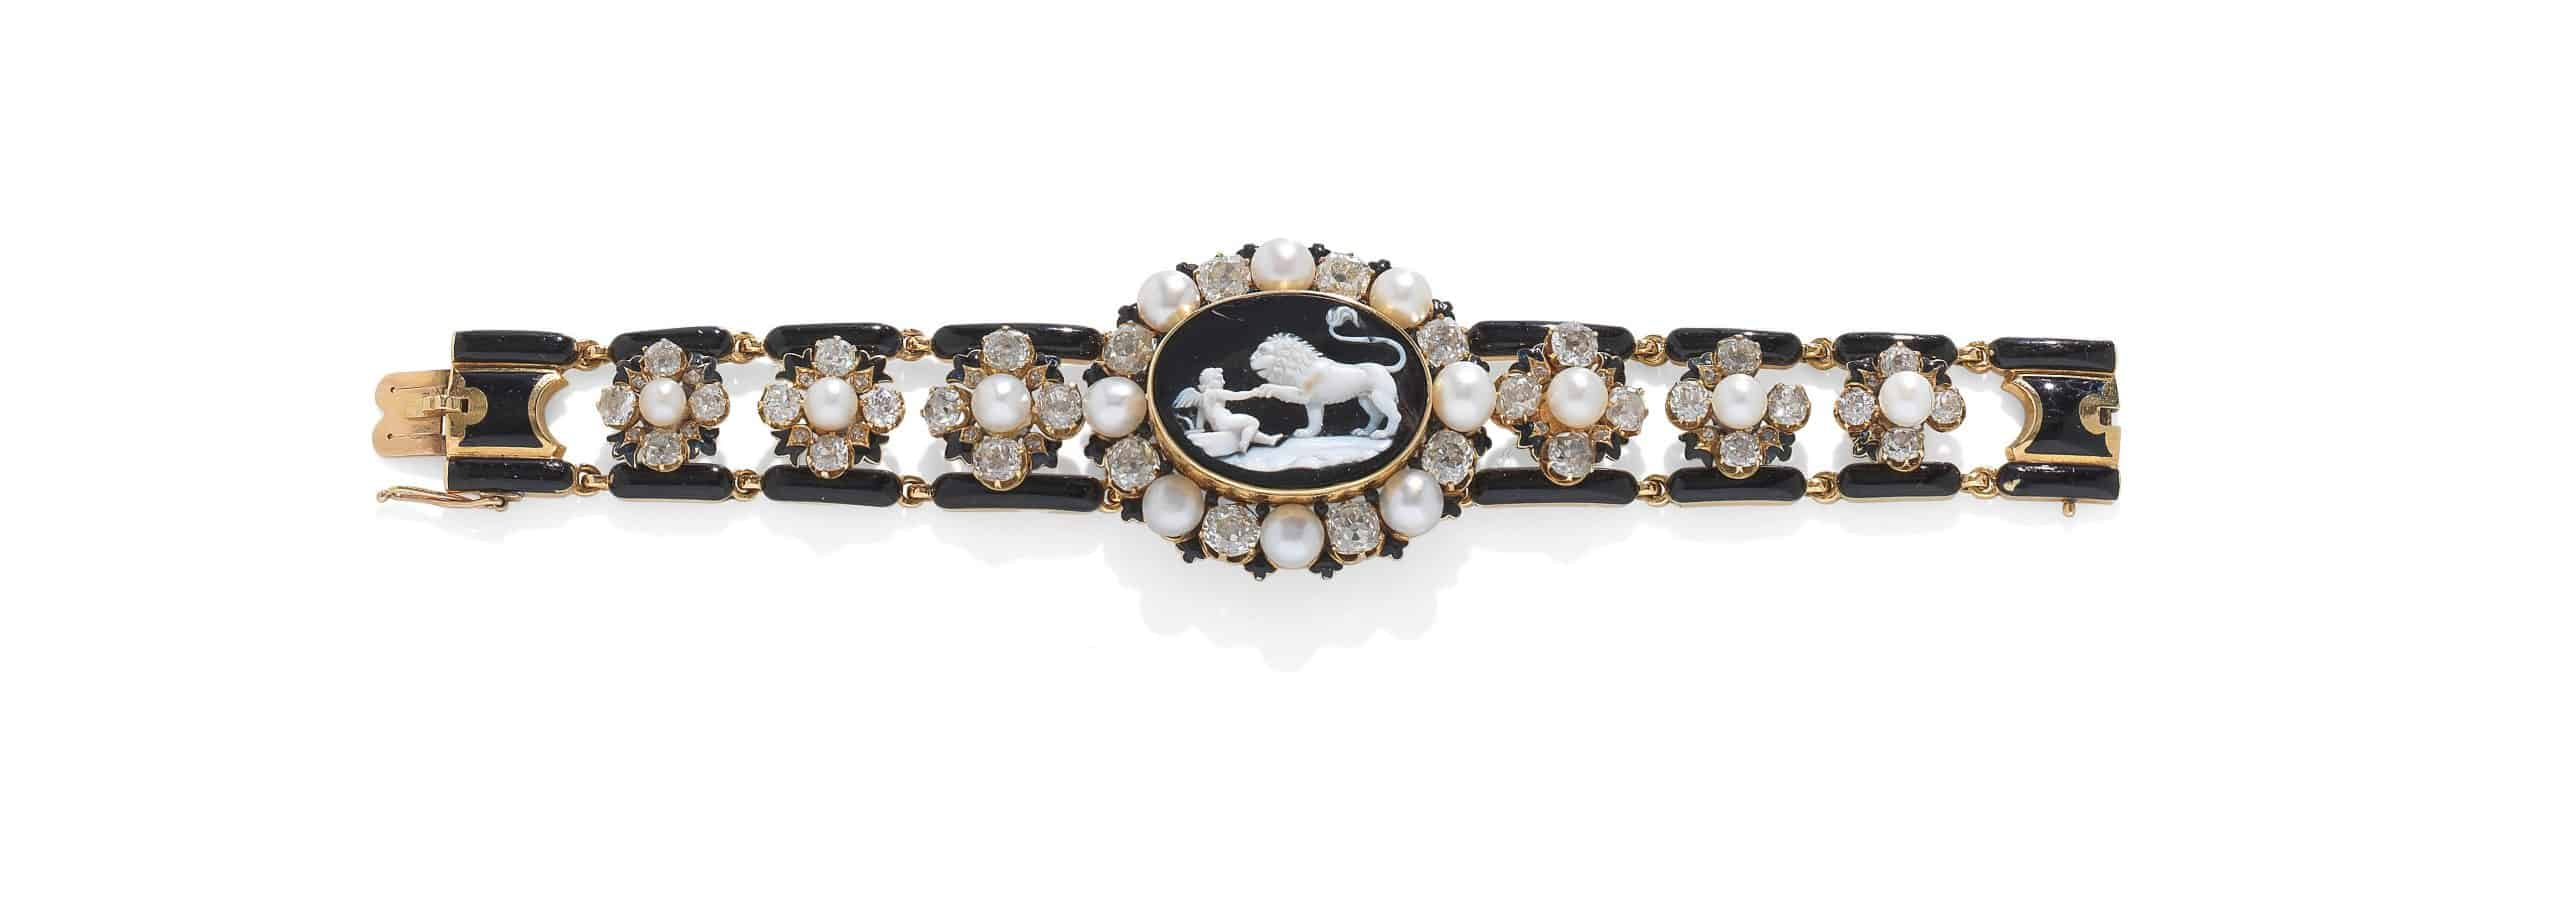 19thCentury Onyx Cameo, Enamel, Pearl and Diamond Bracelet